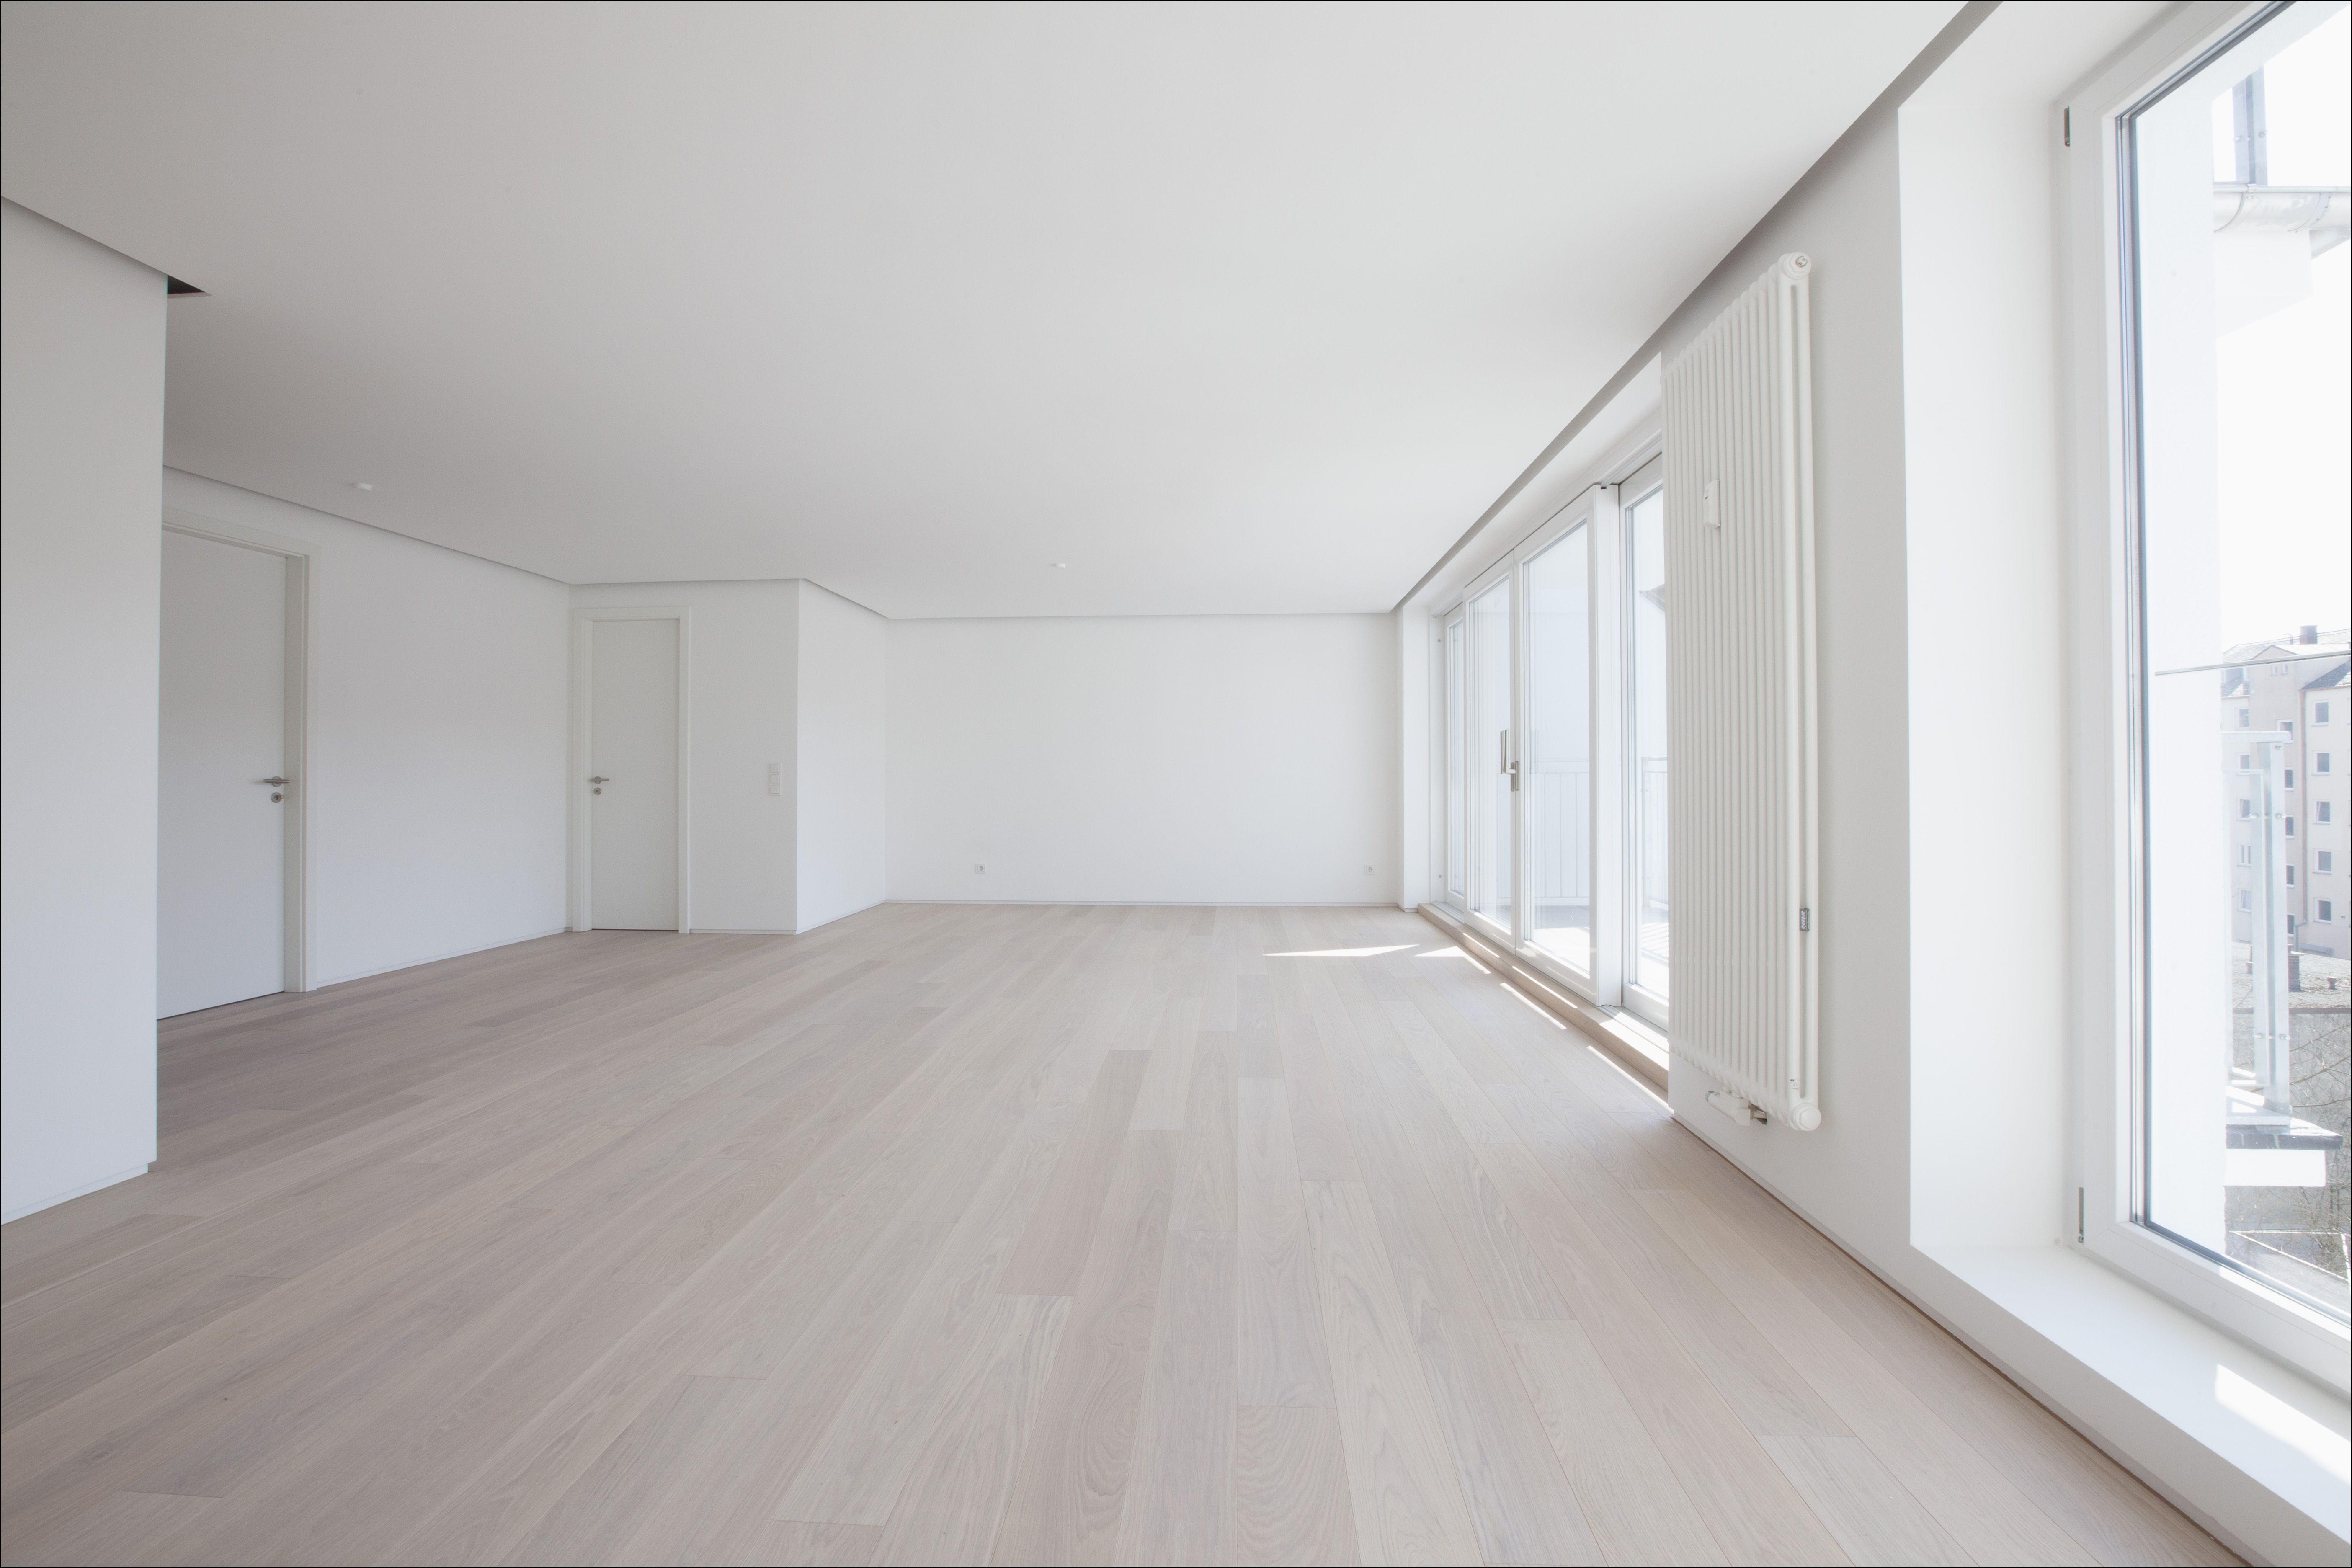 best hardwood floor cleaners 2016 of best place flooring ideas pertaining to best place to buy engineered hardwood flooring images basics favorite hybrid engineered wood floors of best